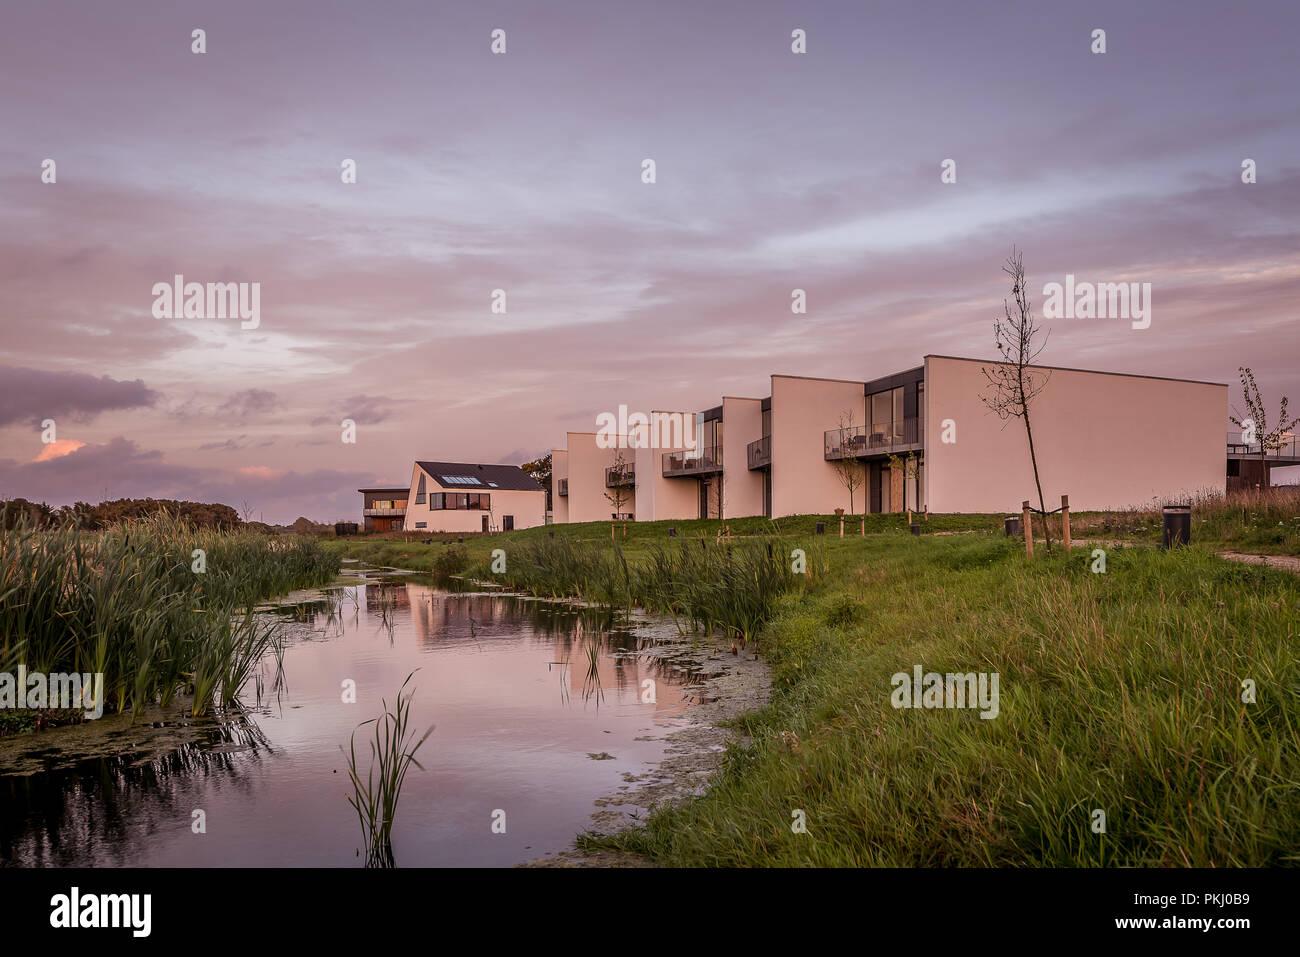 new modern villas in the criticized project of vinge frederikssund